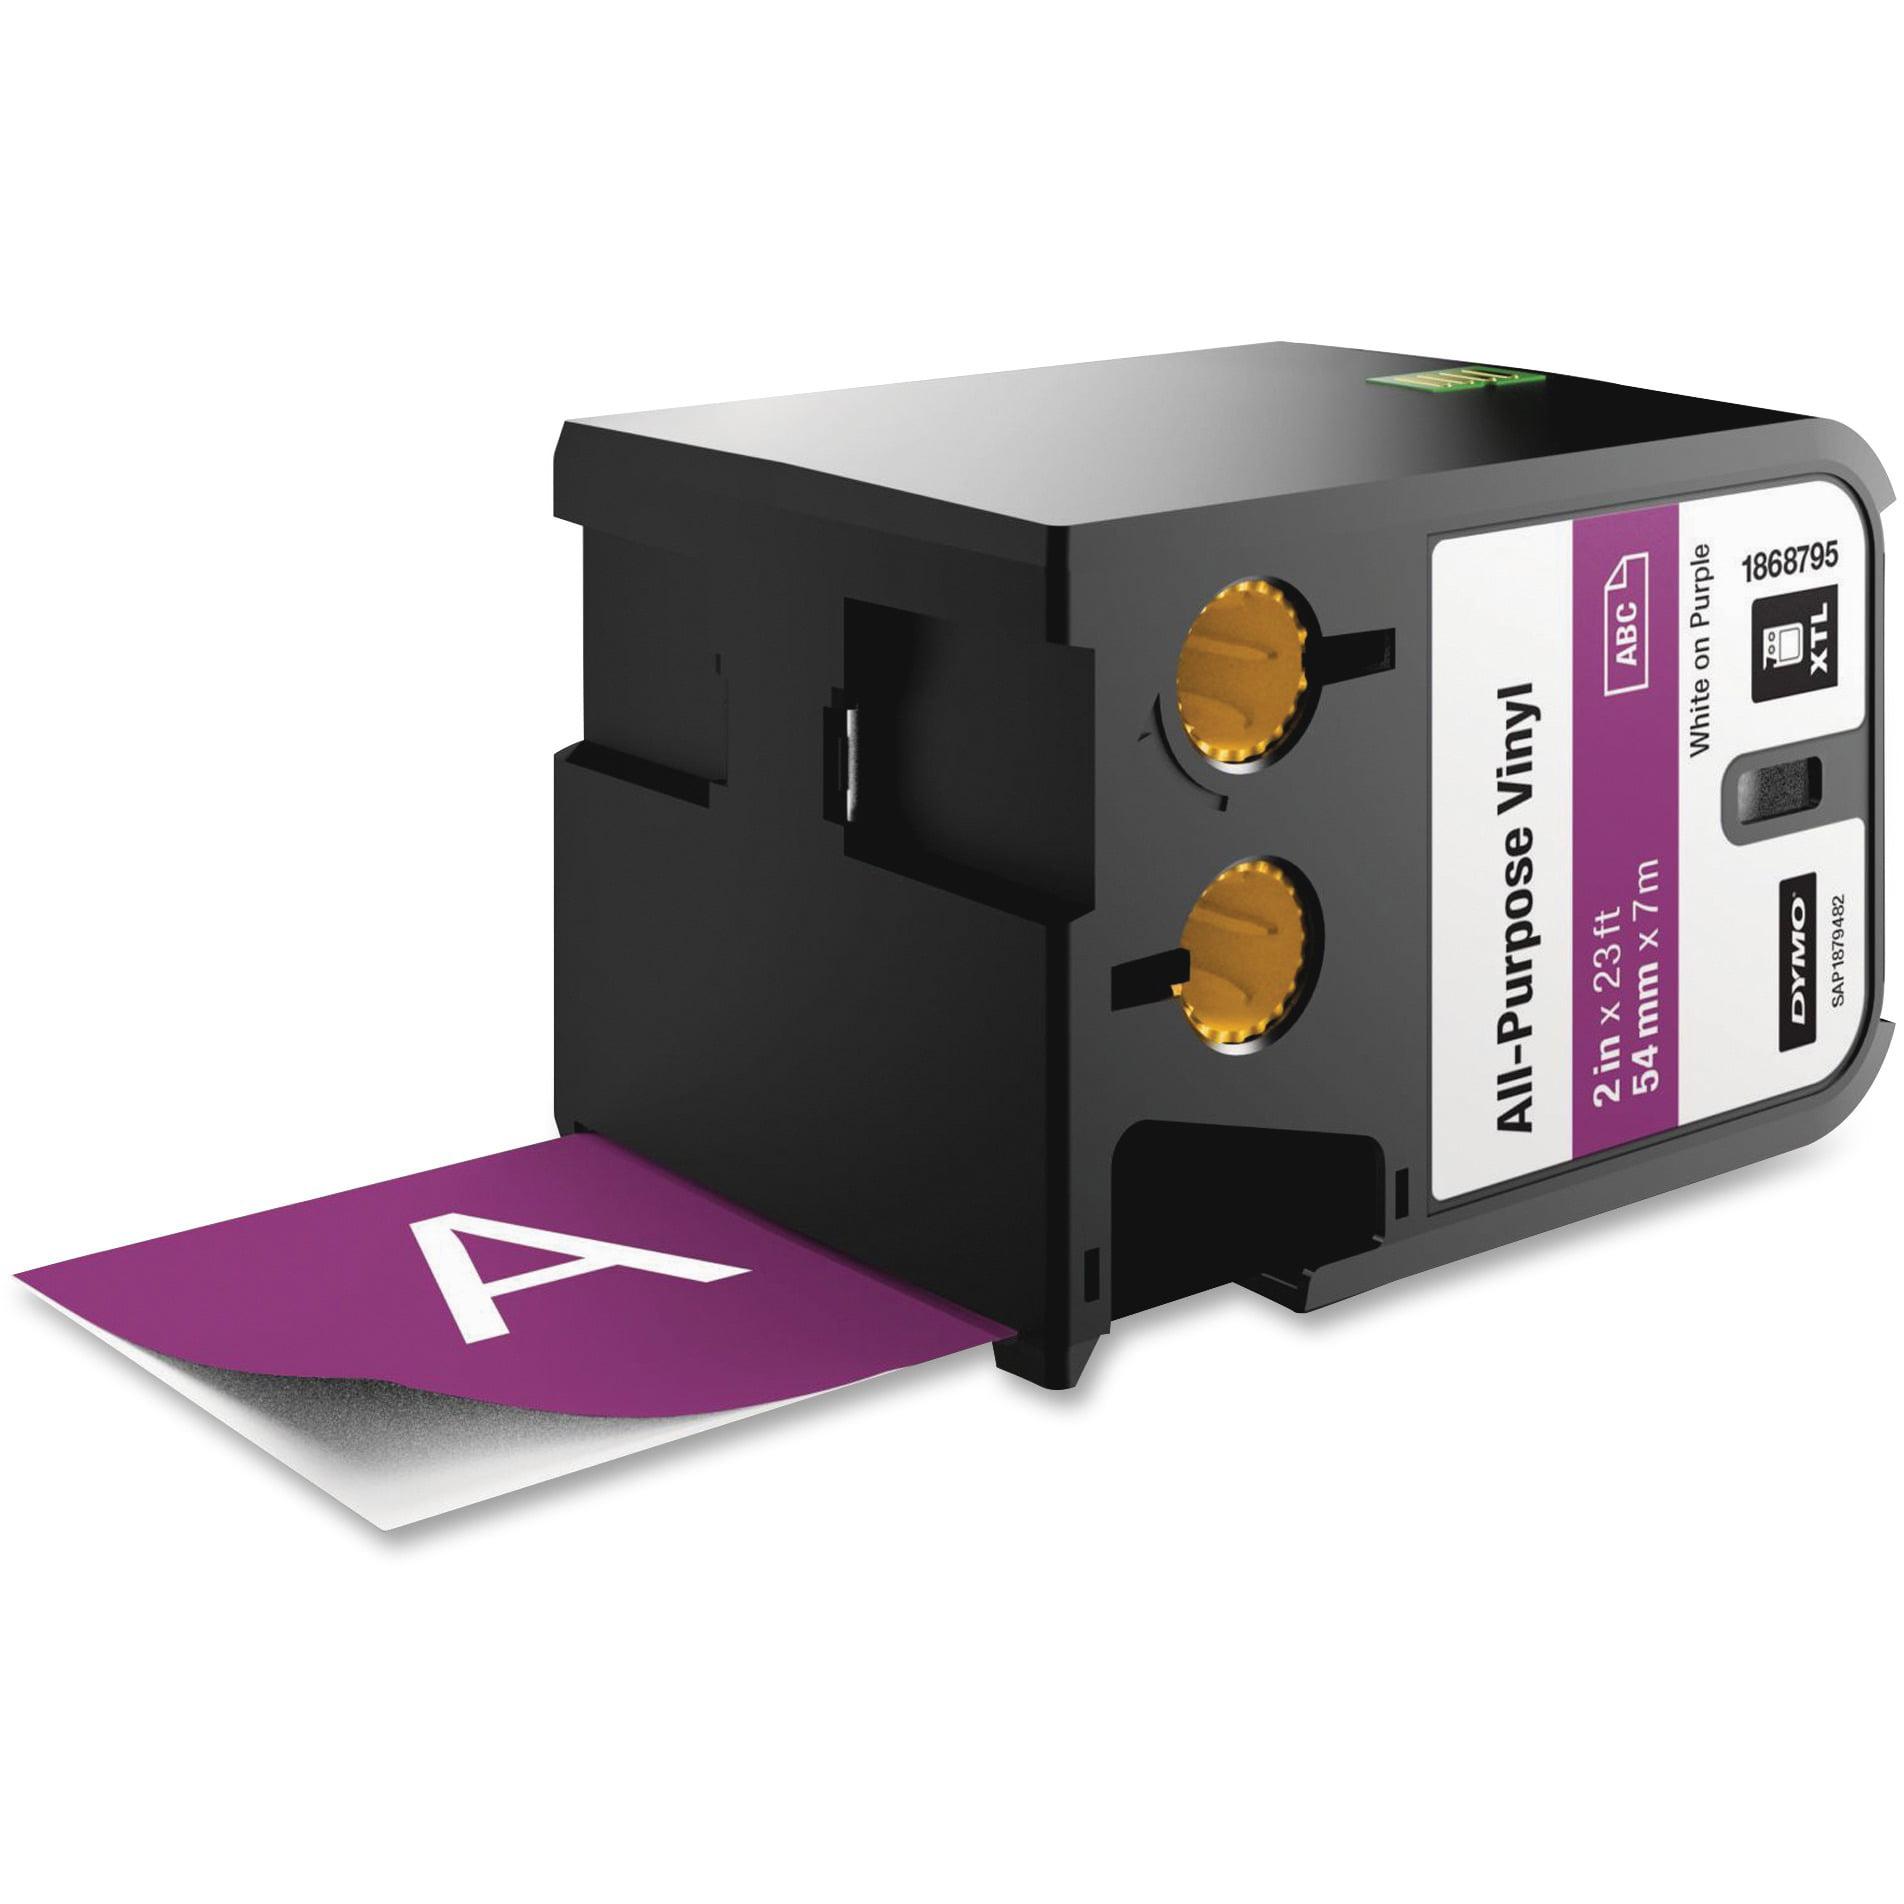 Dymo, DYM1868795, XTL All-Purpose Vinyl Label Cartridge, 1 Each, Purple